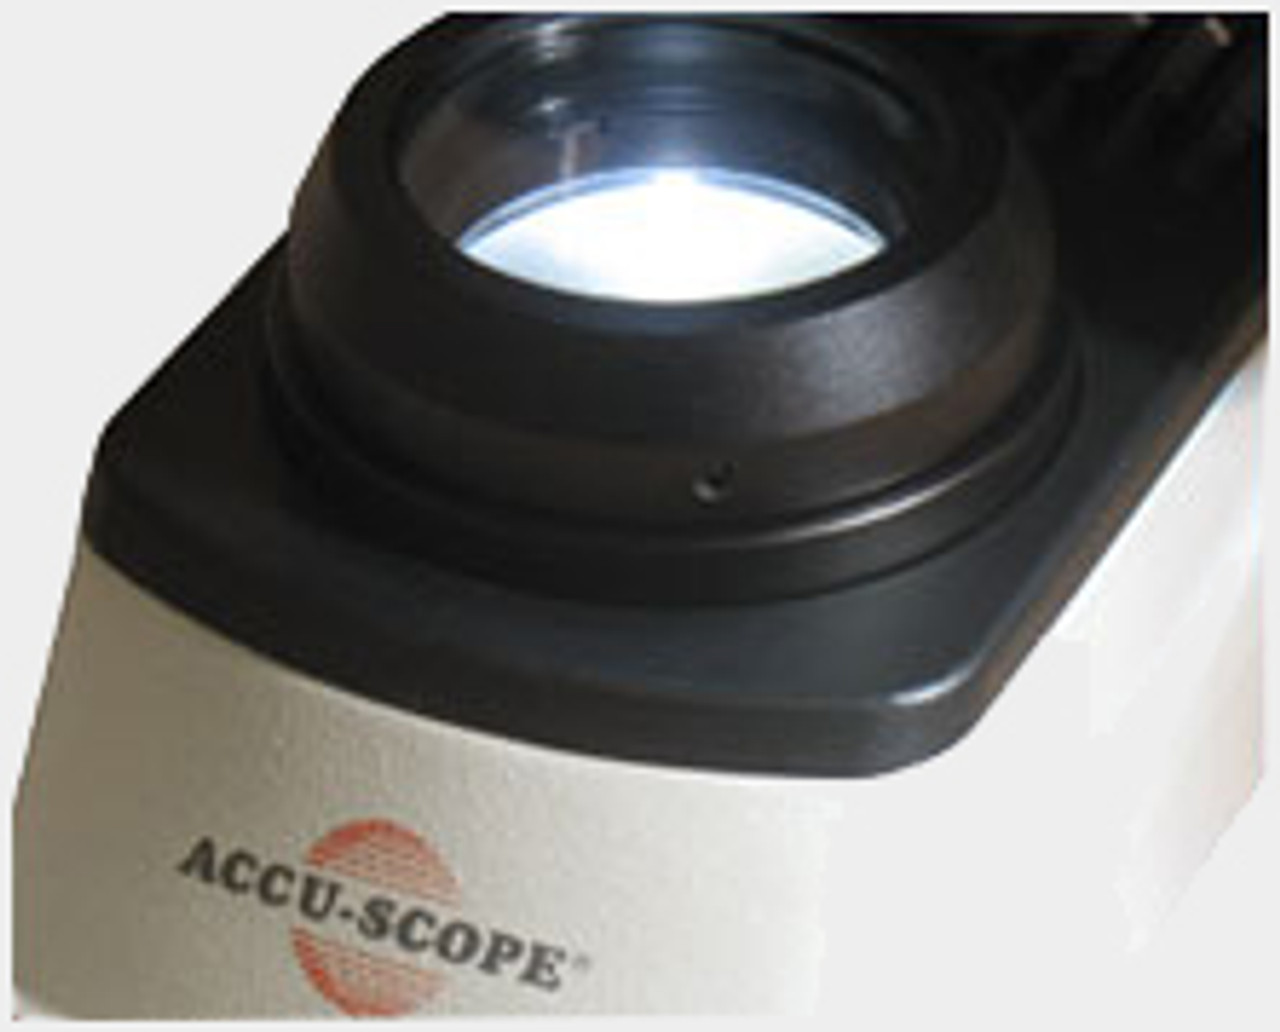 Accu-Scope 3000-LED 3 Watt LED